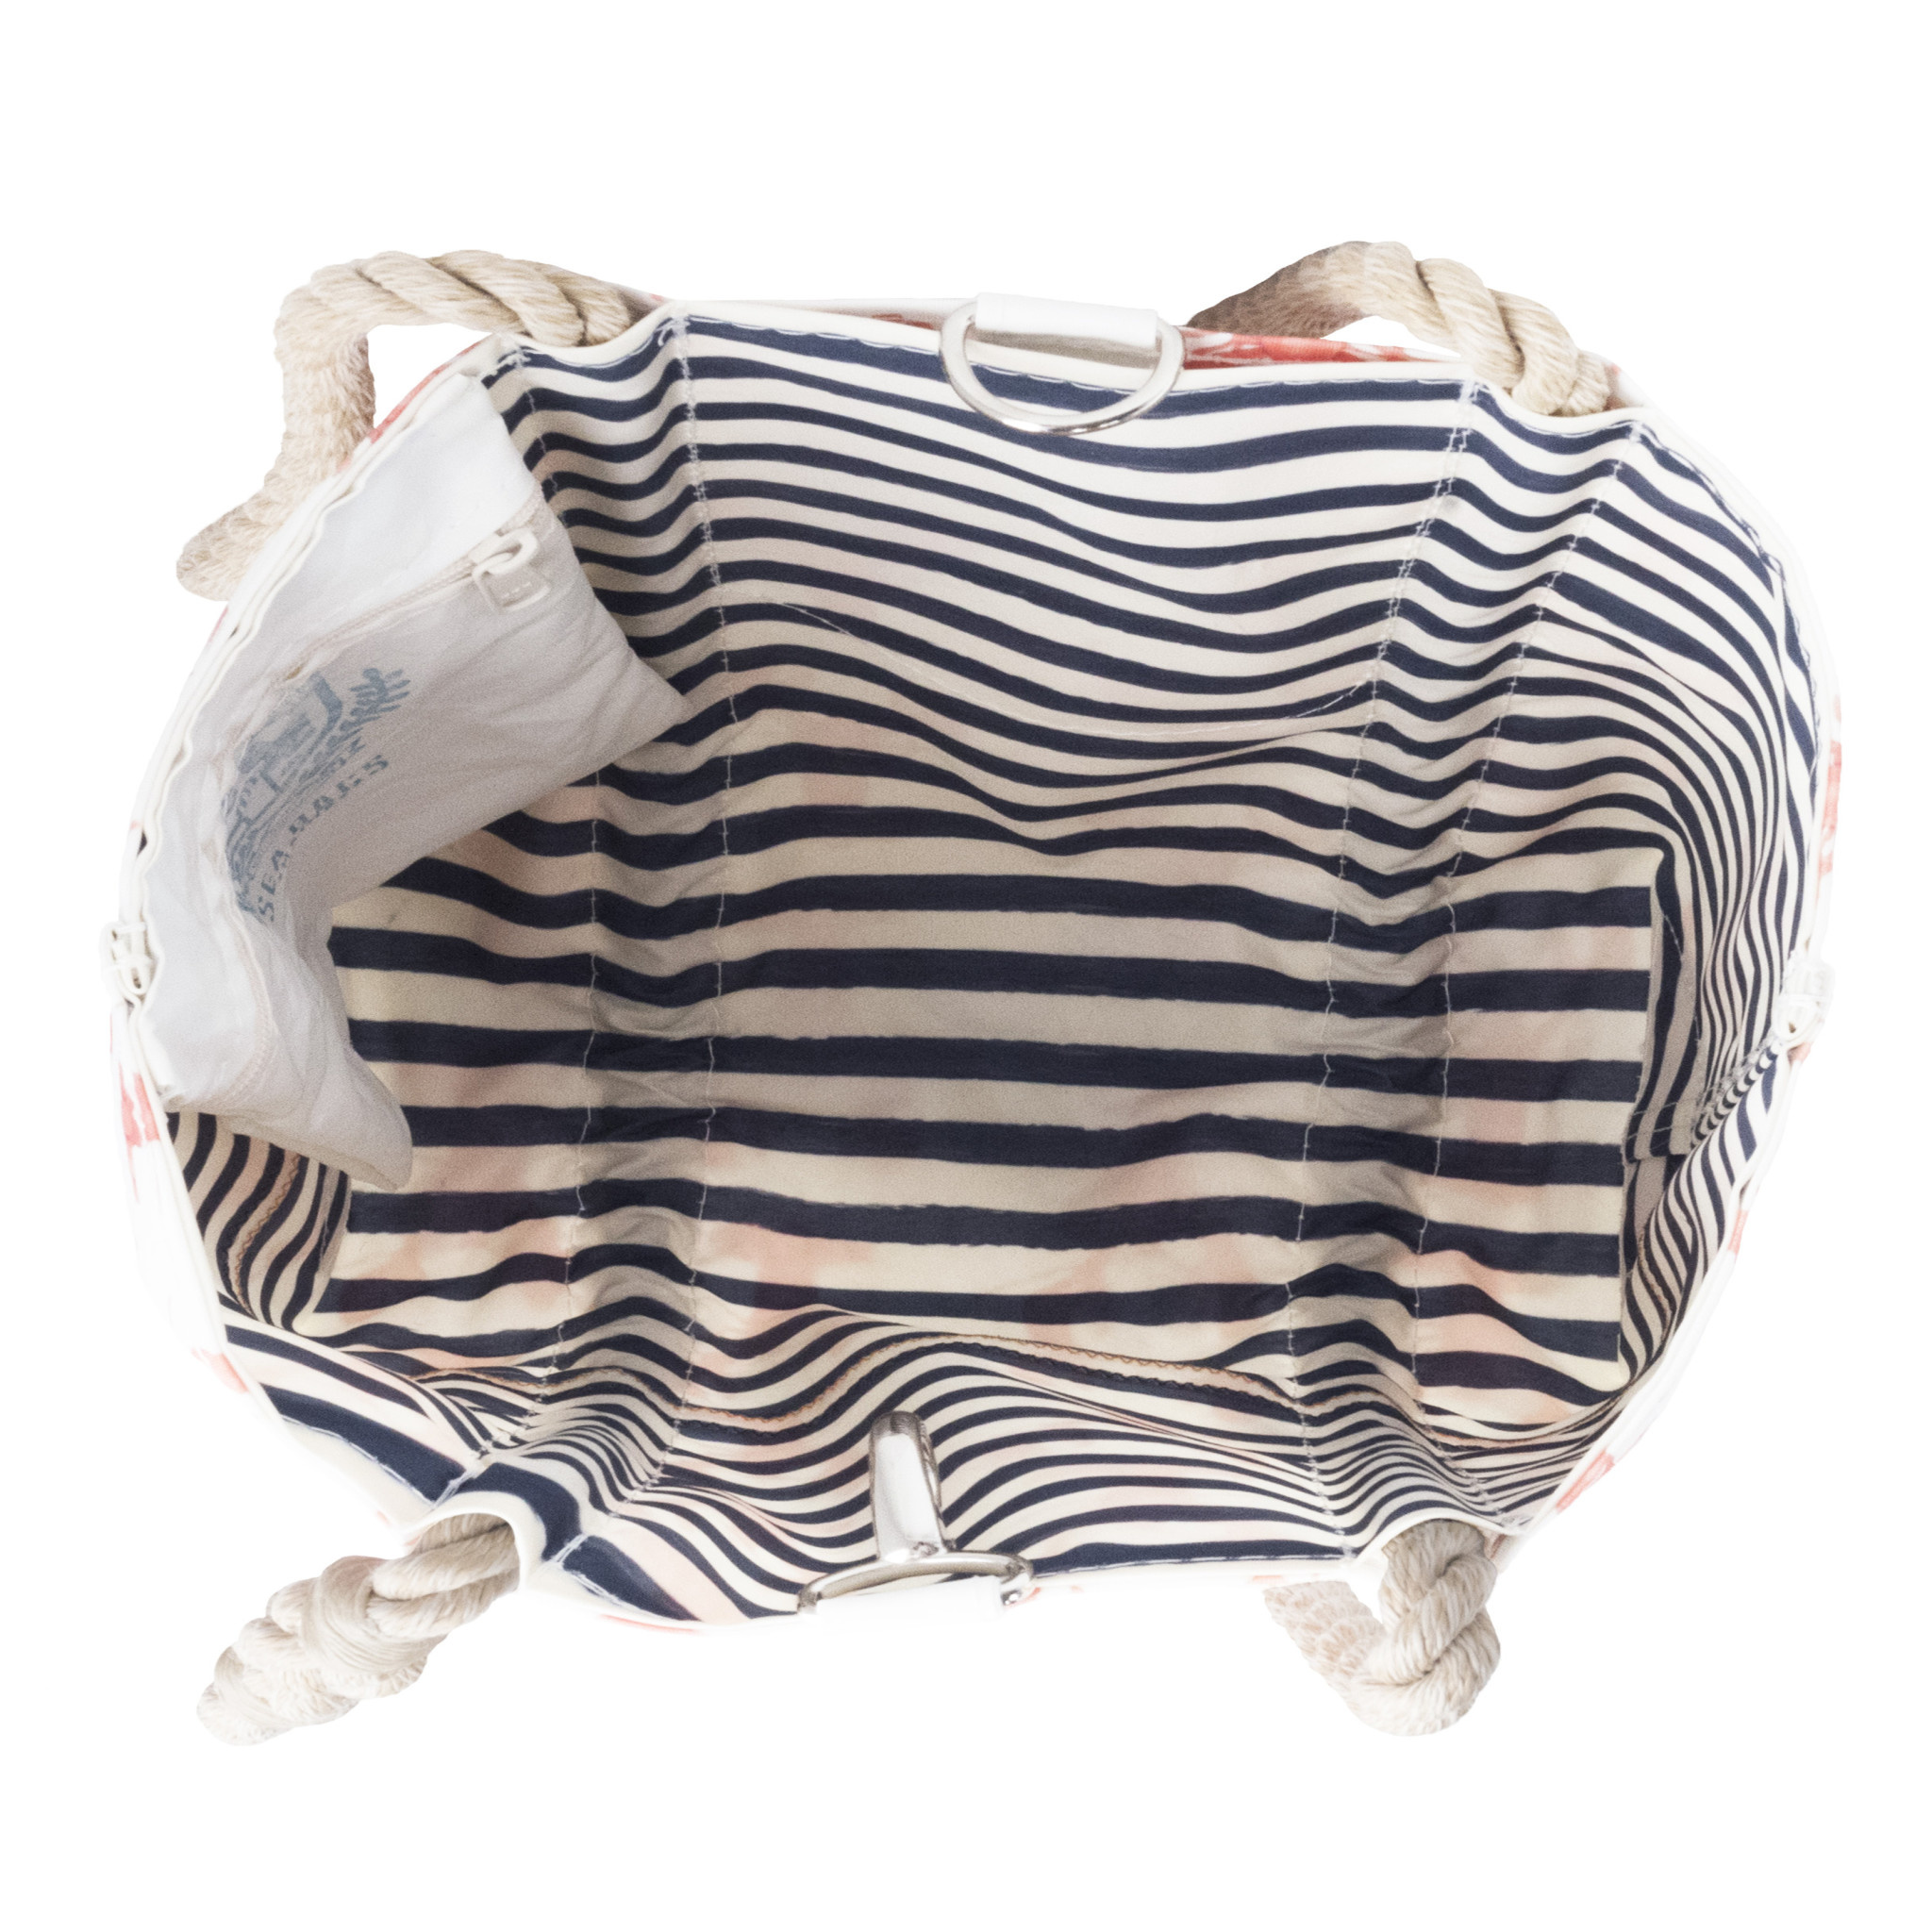 Sea Bags Sara Fitz Lobster Pattern Tote - Hemp Handle - Medium with Clasp